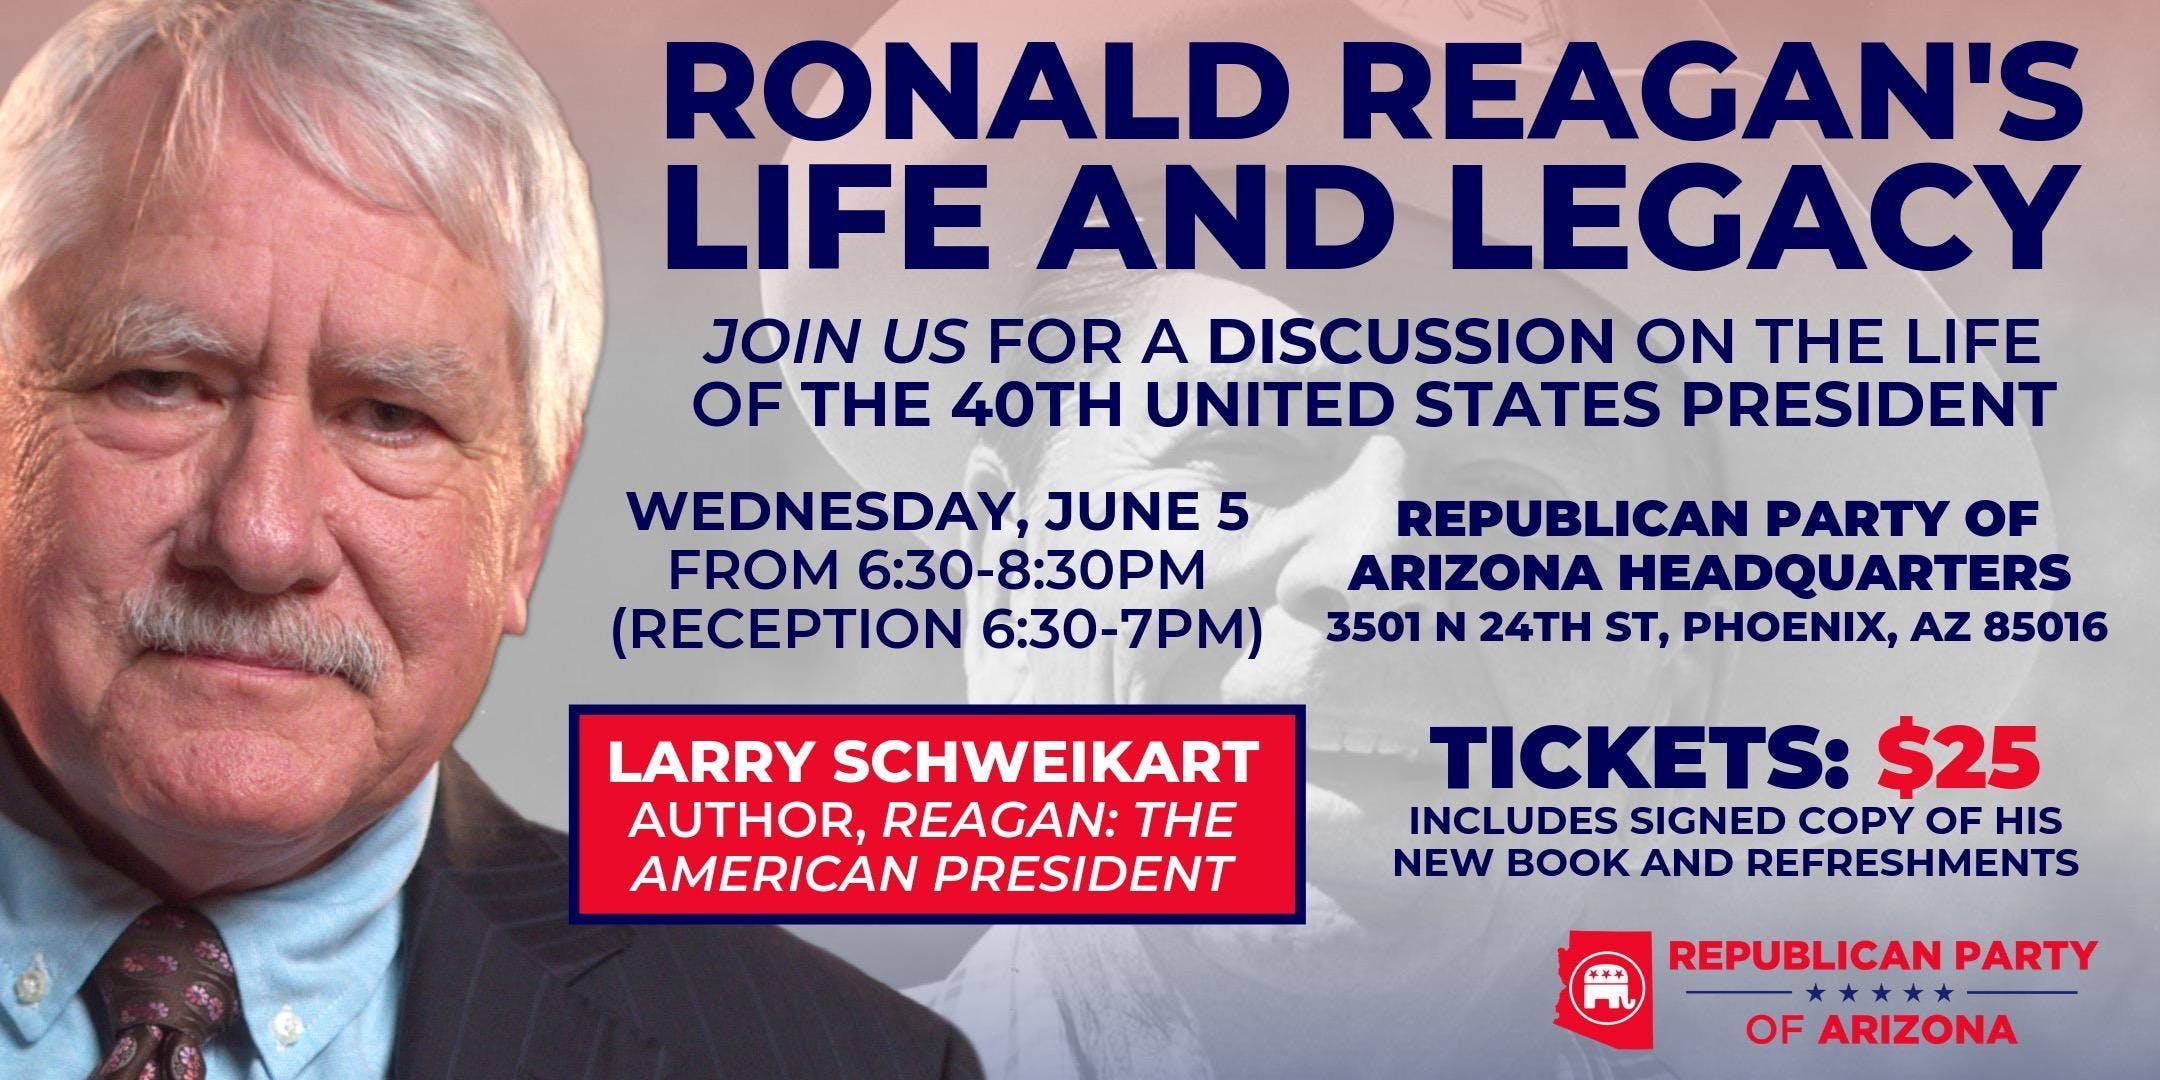 Ronald Reagan's Life and Legacy